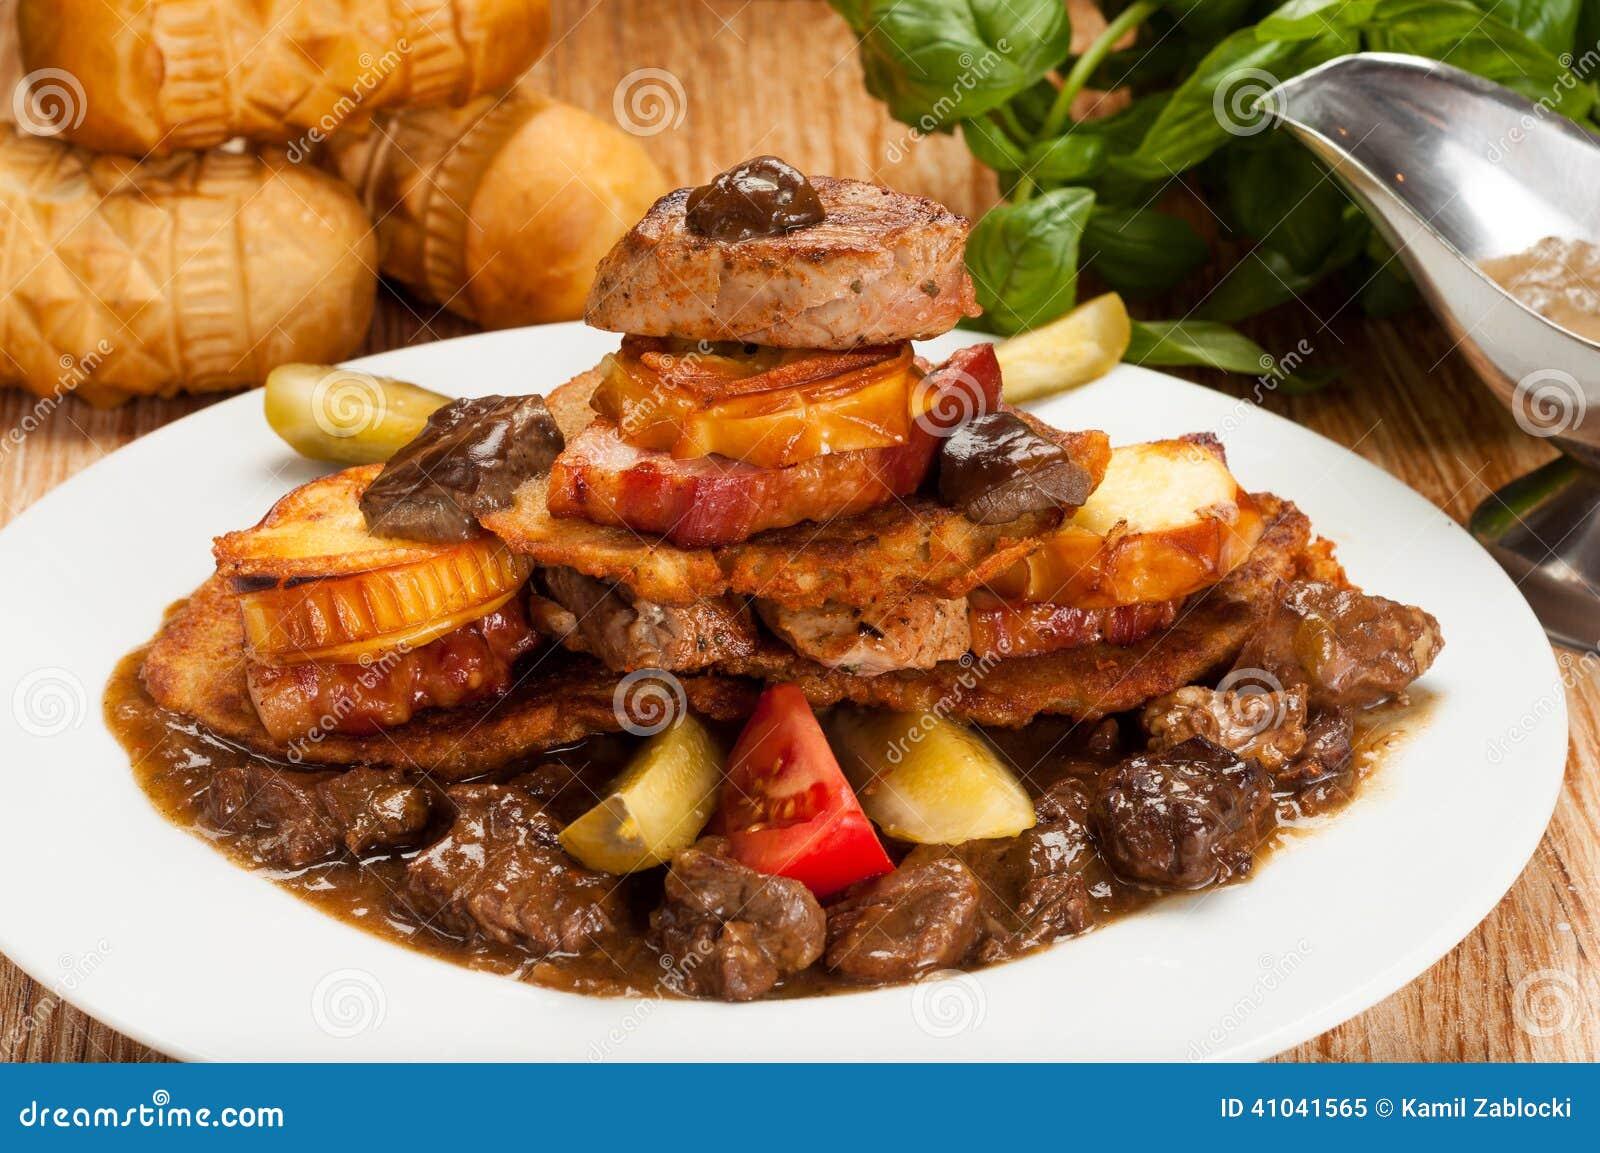 Greasy Unhealthy Food Stock Photo - Image: 41041565